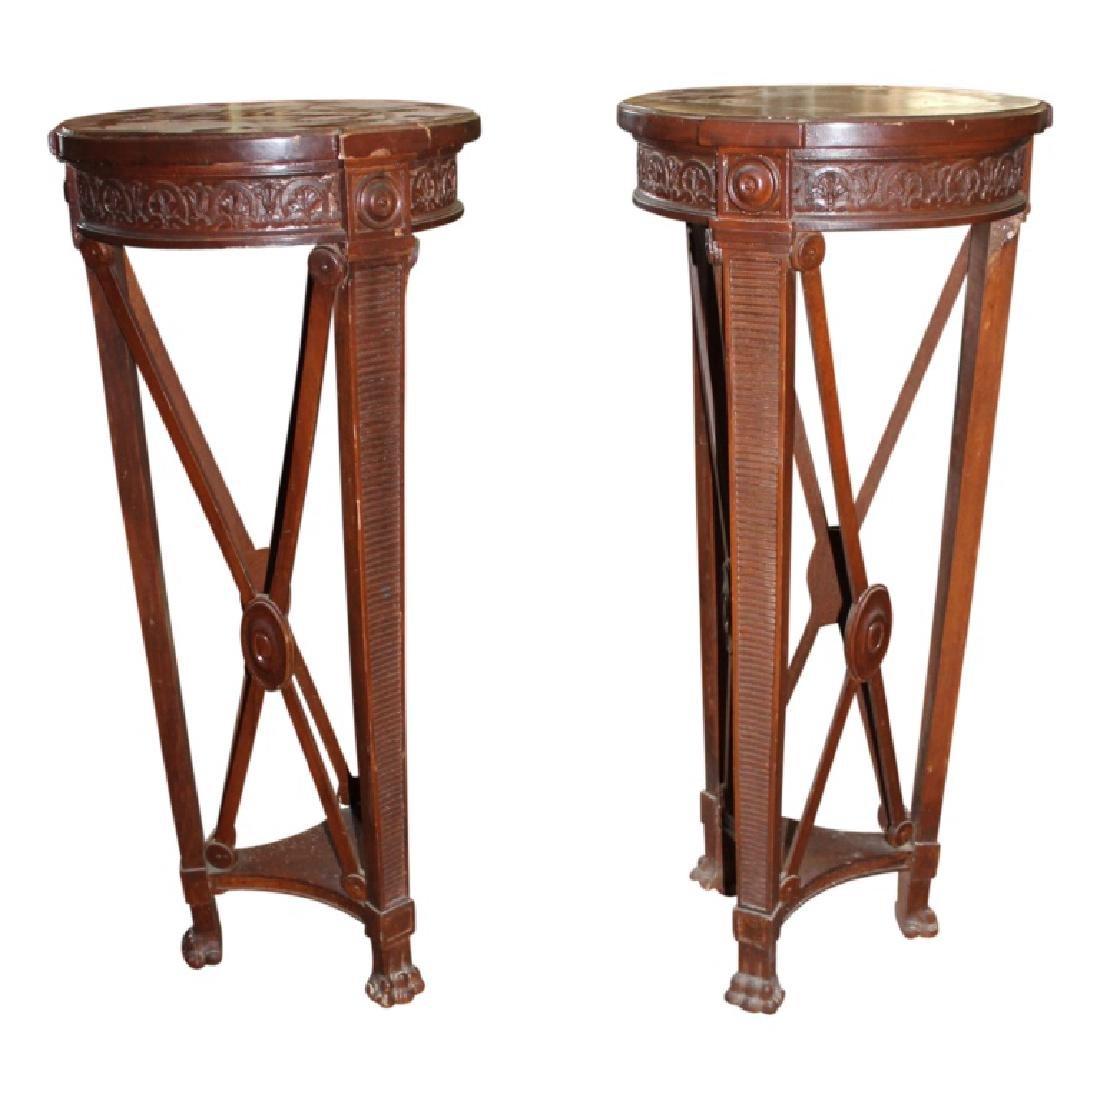 Pair of Georgian Style Pedestals